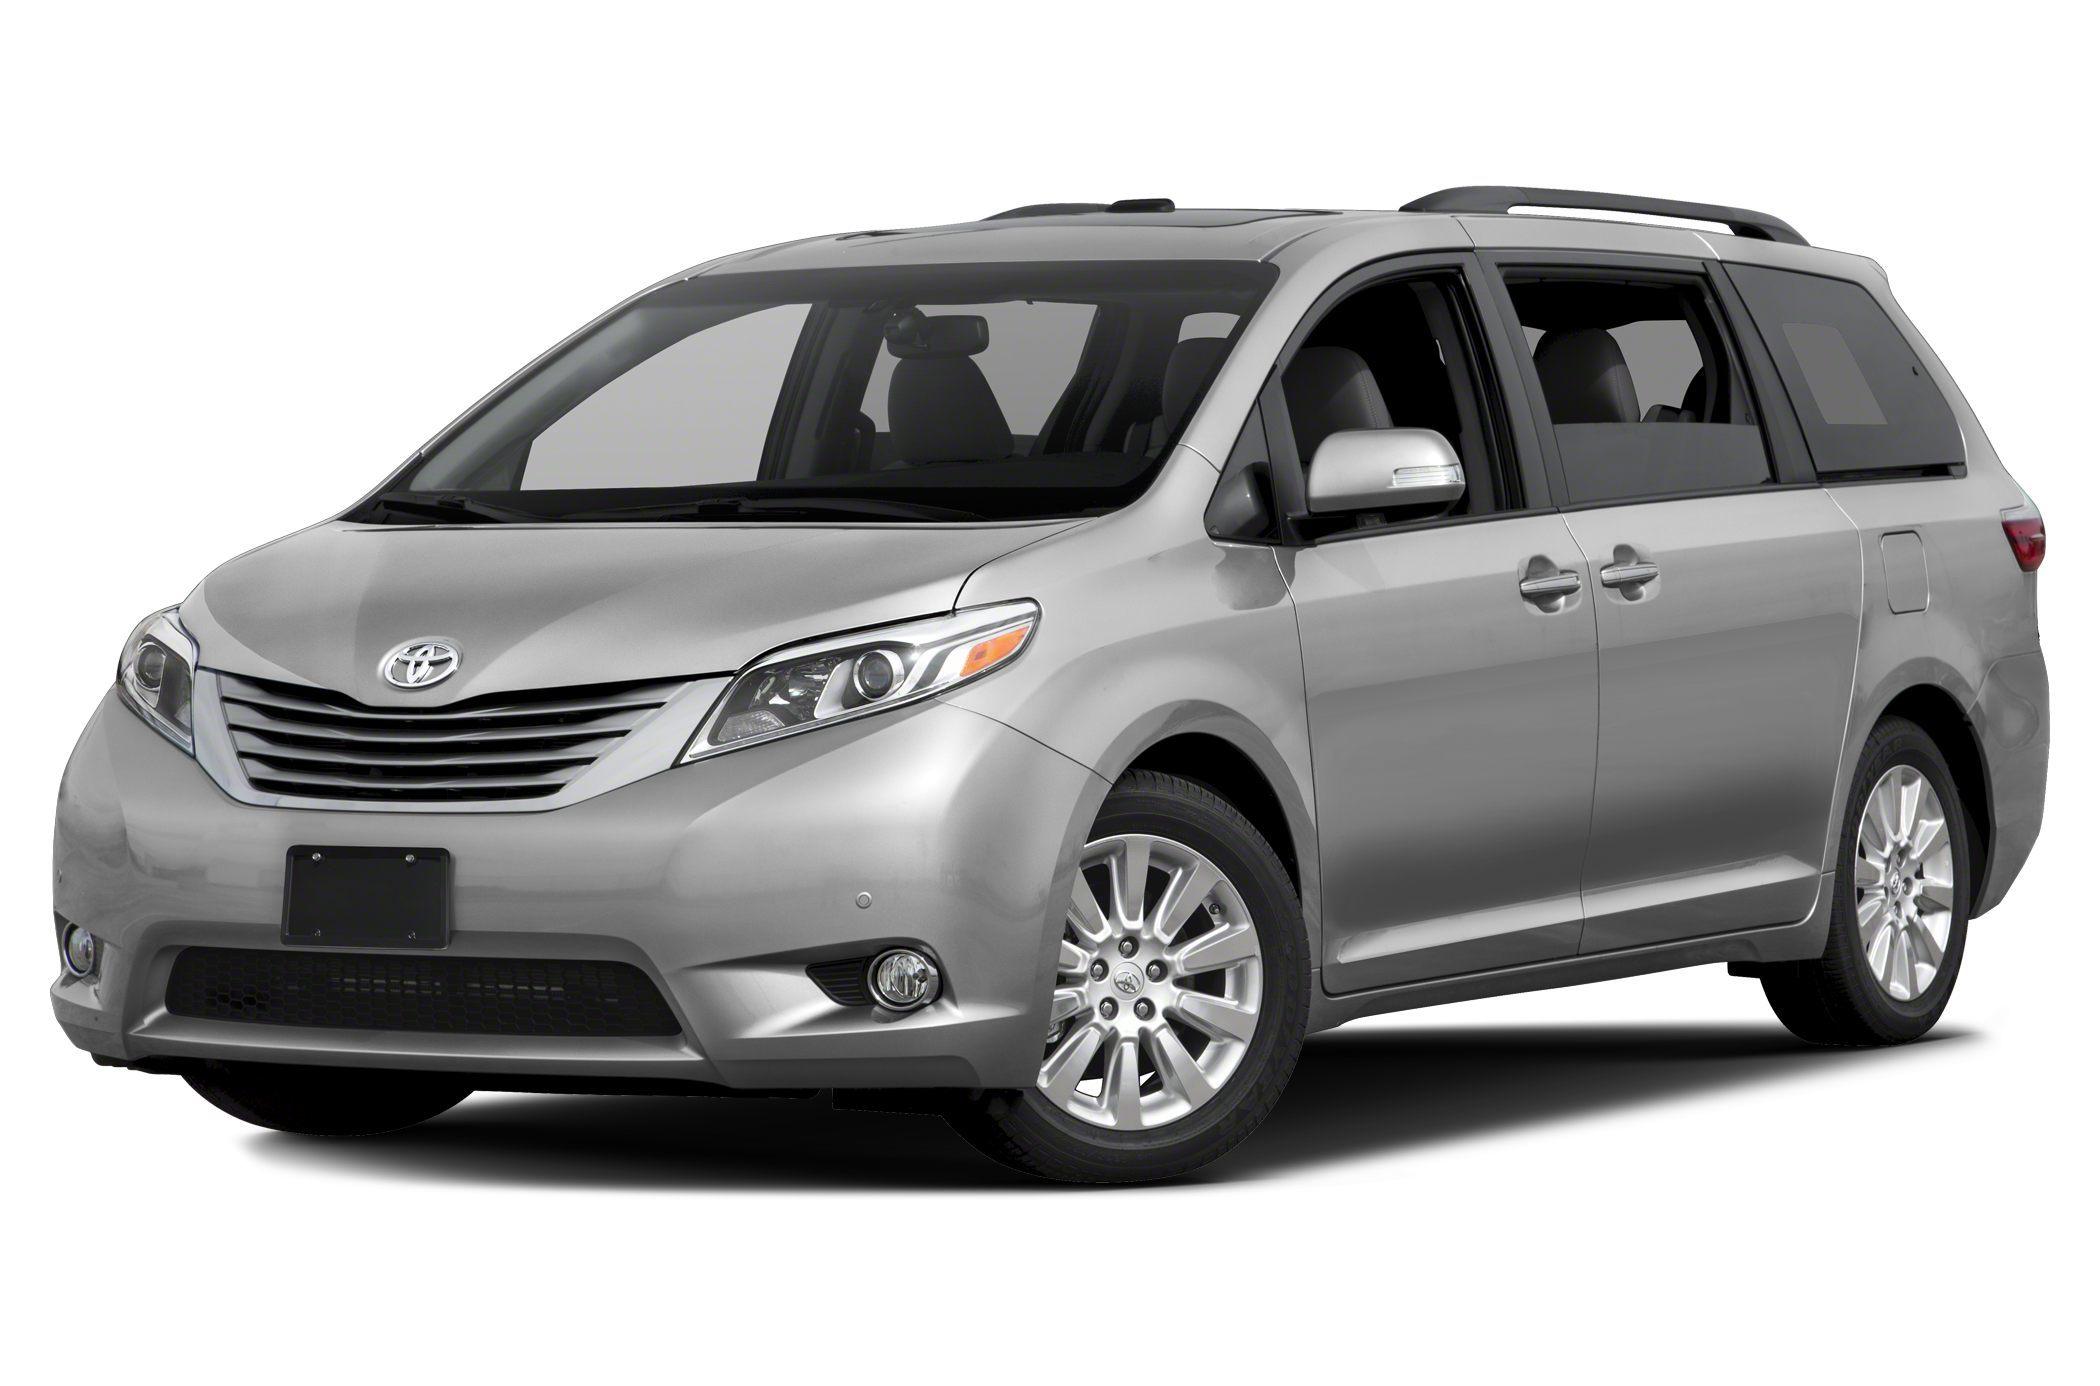 Kolar Toyota Duluth Minnesota >> Toyota Sienna Duluth Kolar Toyota